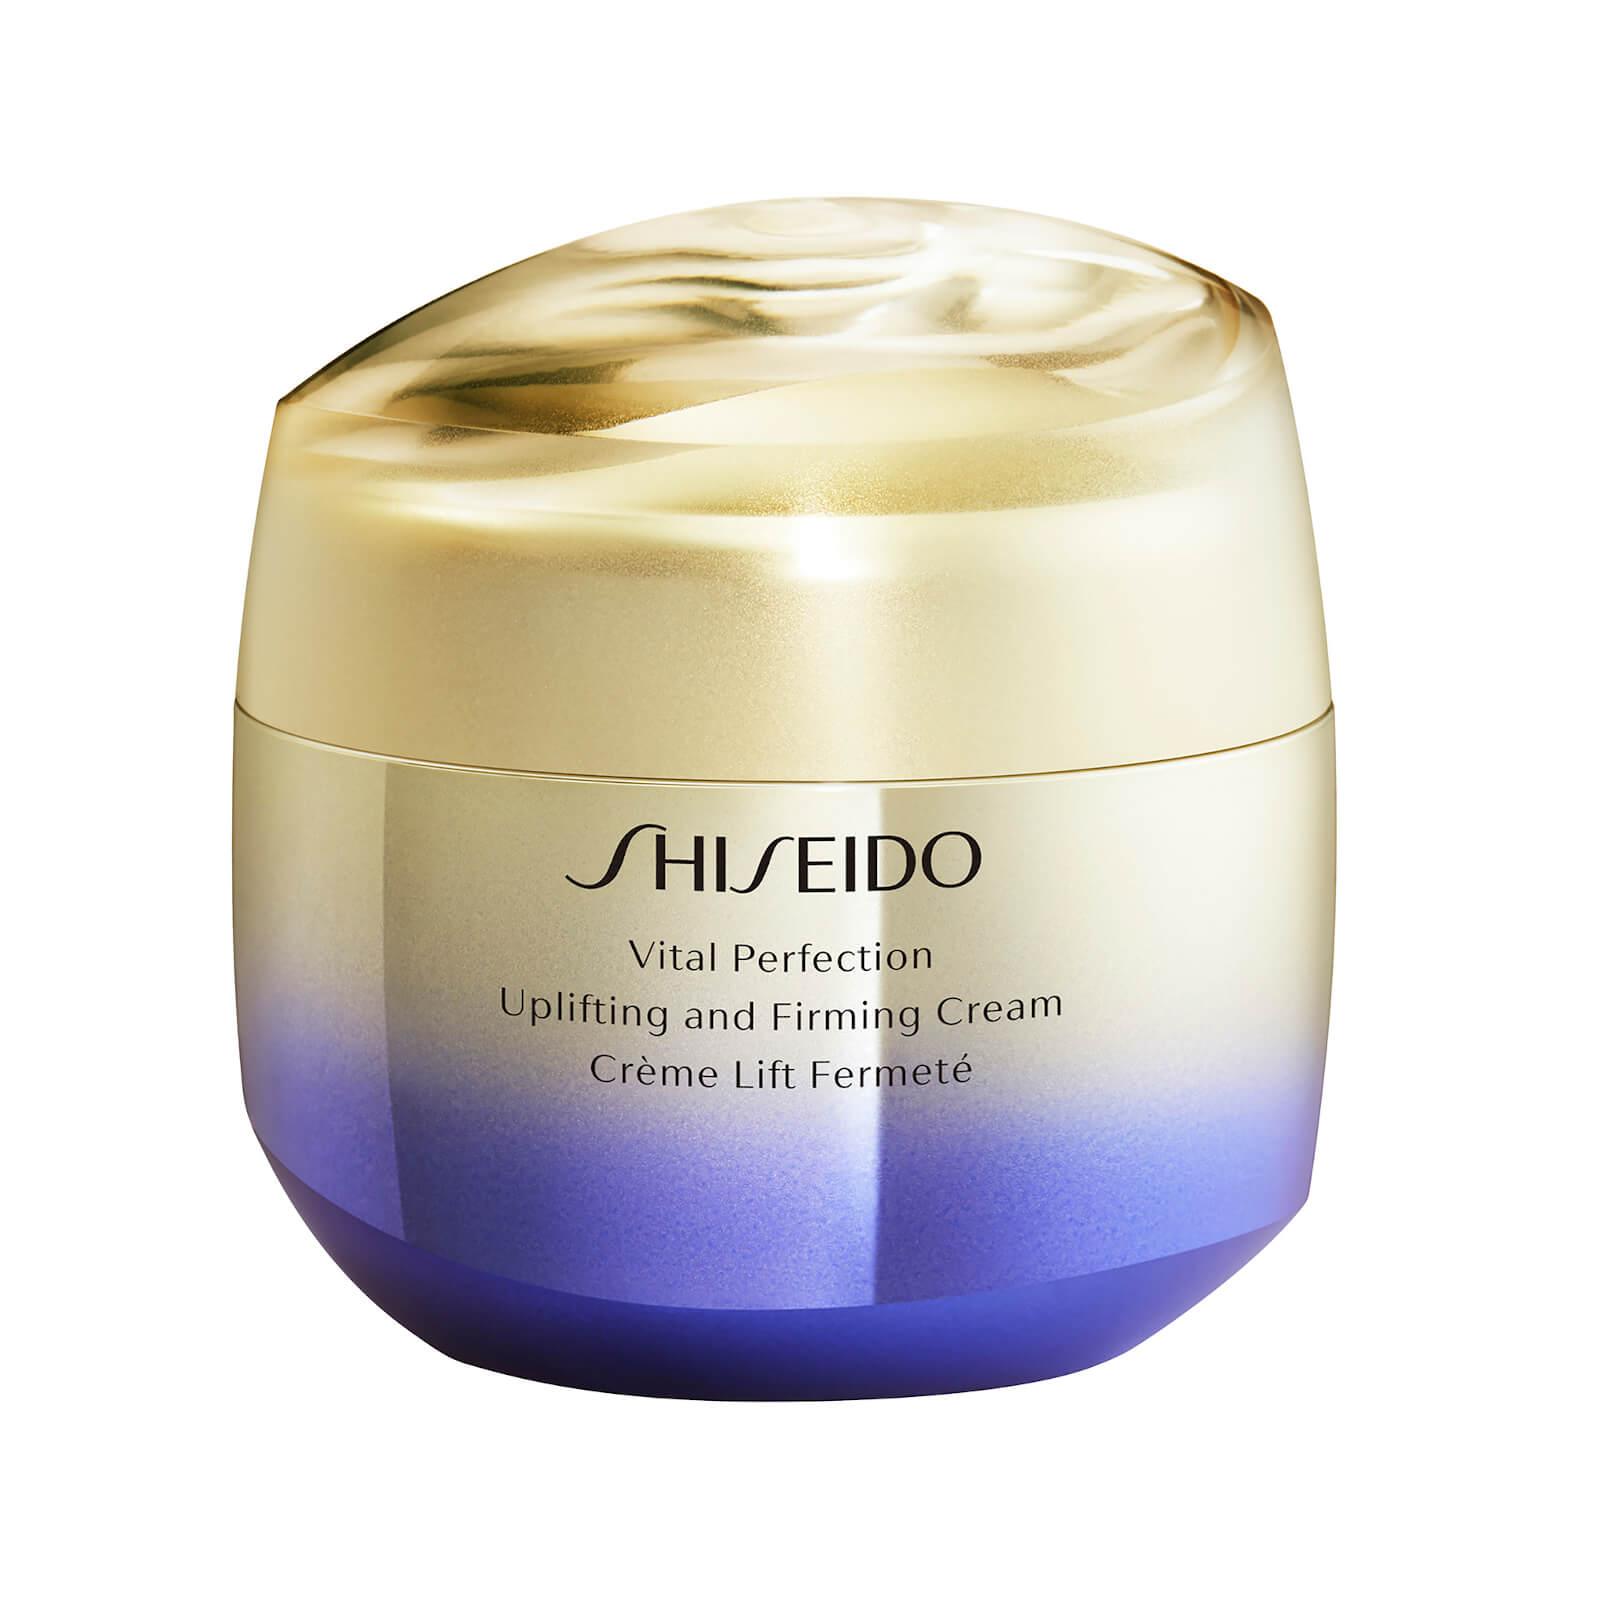 Купить Крем для лица Shiseido Vital Perfection Uplifting and Firming Cream 75ml